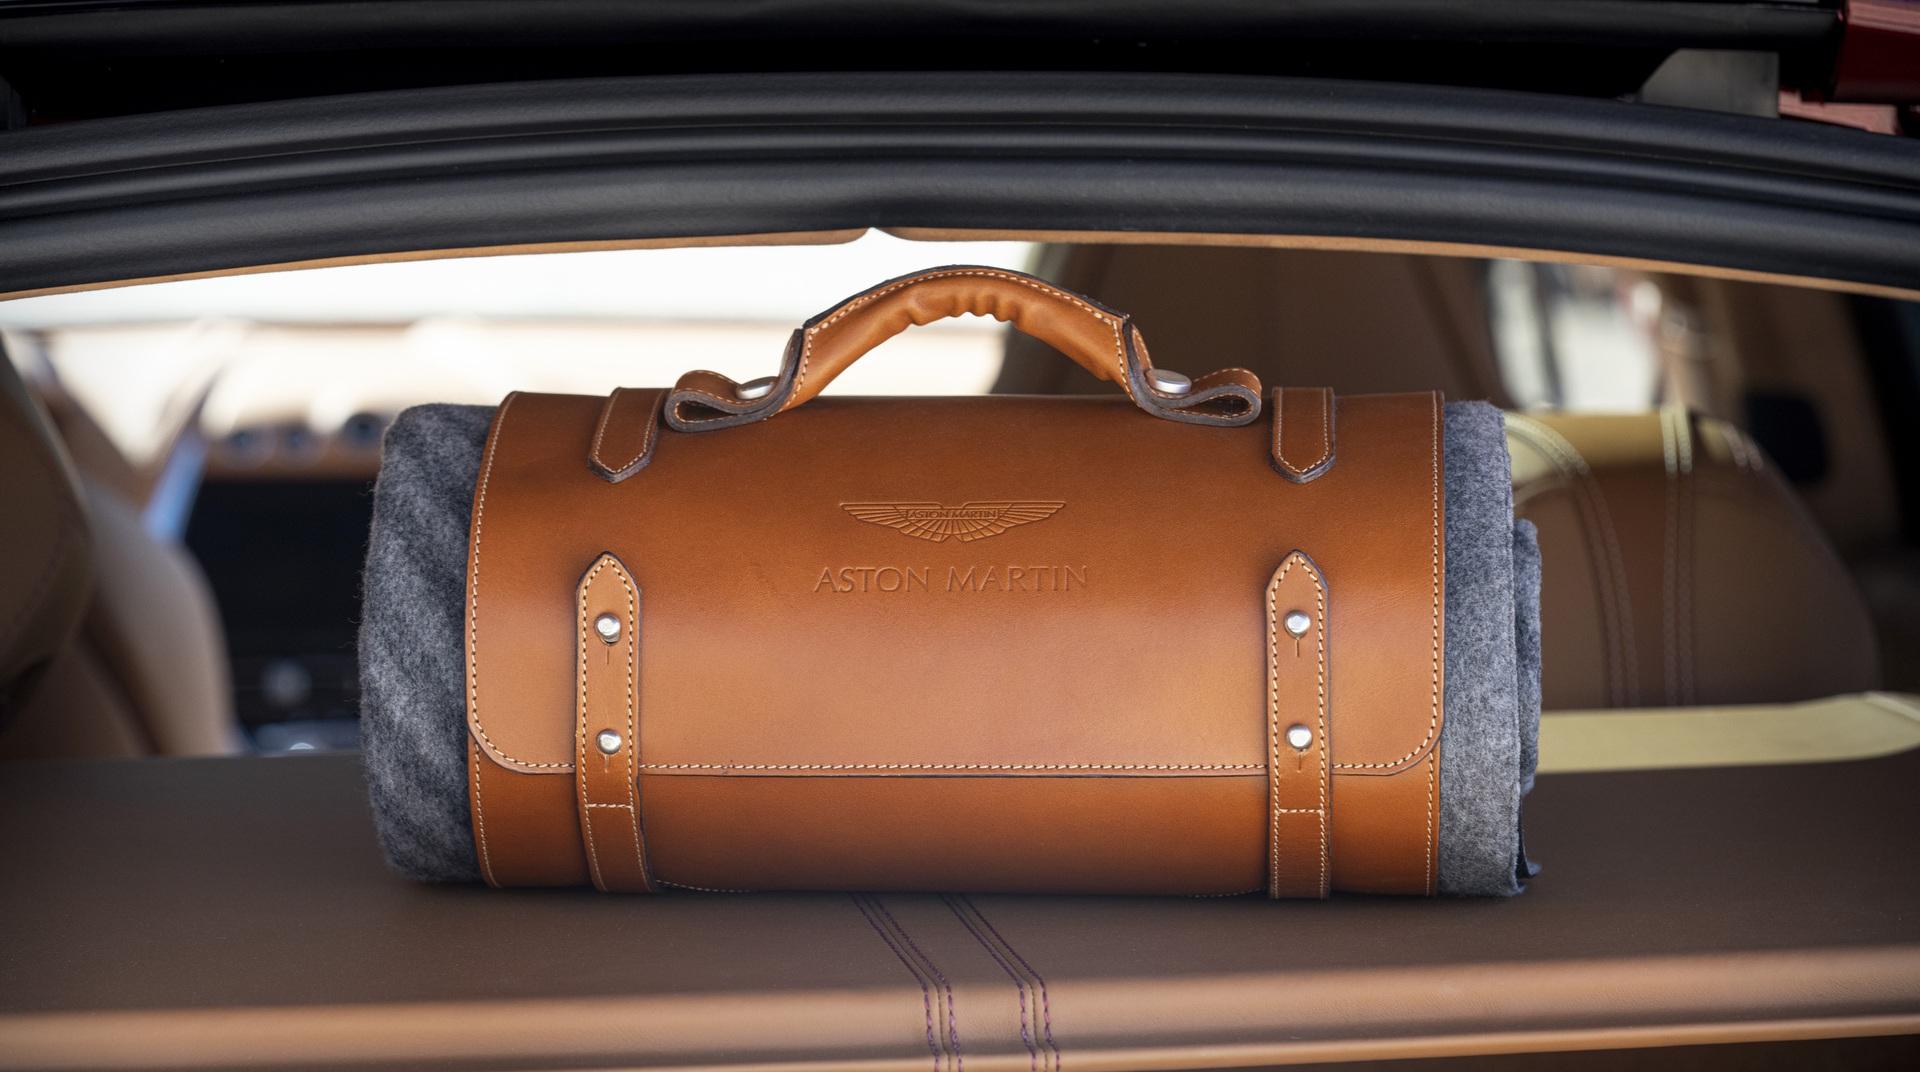 Aston-Martin-DBX-Picnic-Blanket